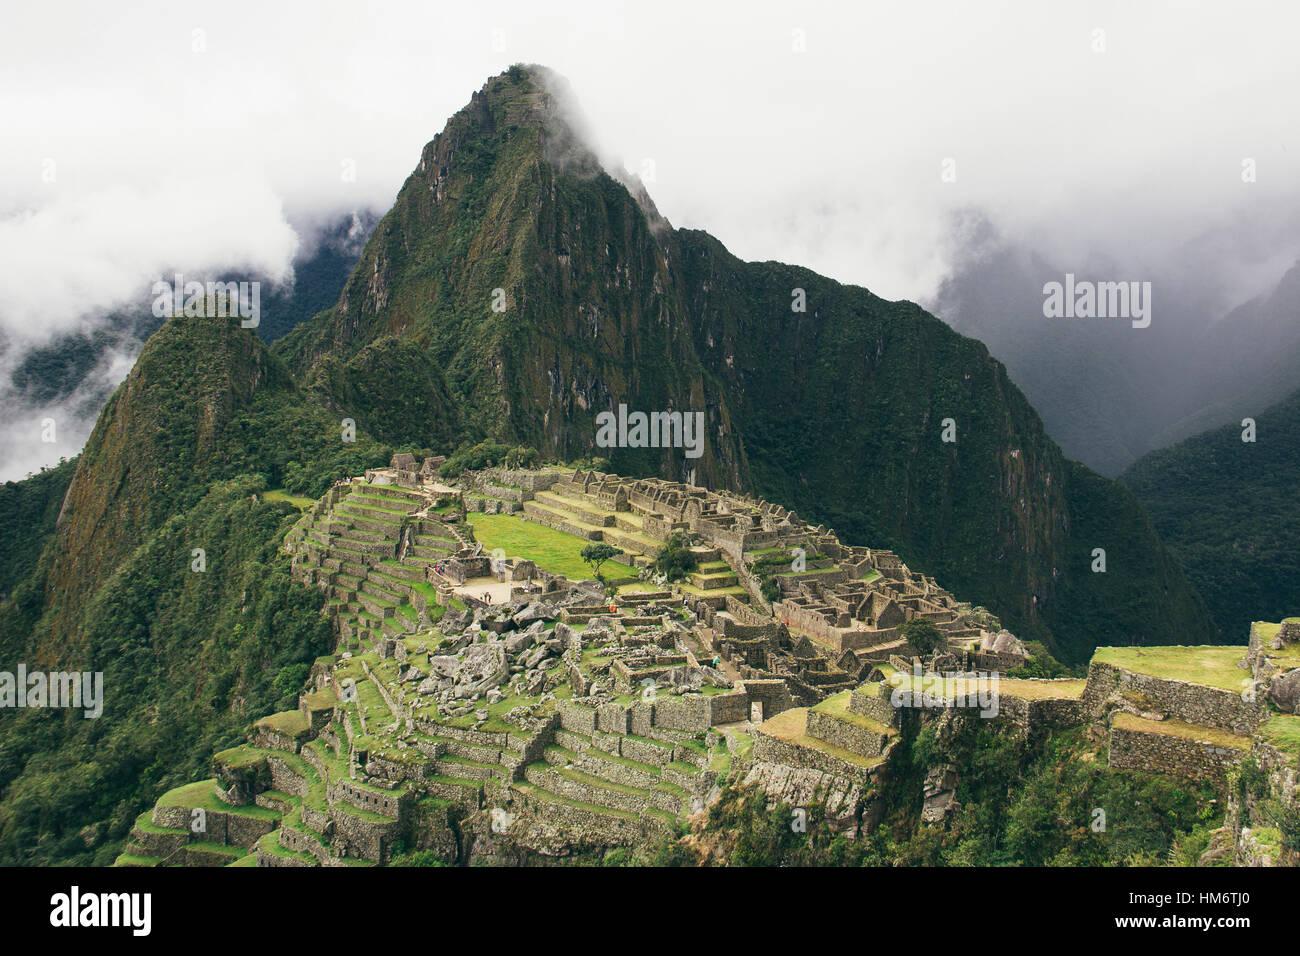 Aerial view of historic machu picchu against Mt huayna picchu peak - Stock Image